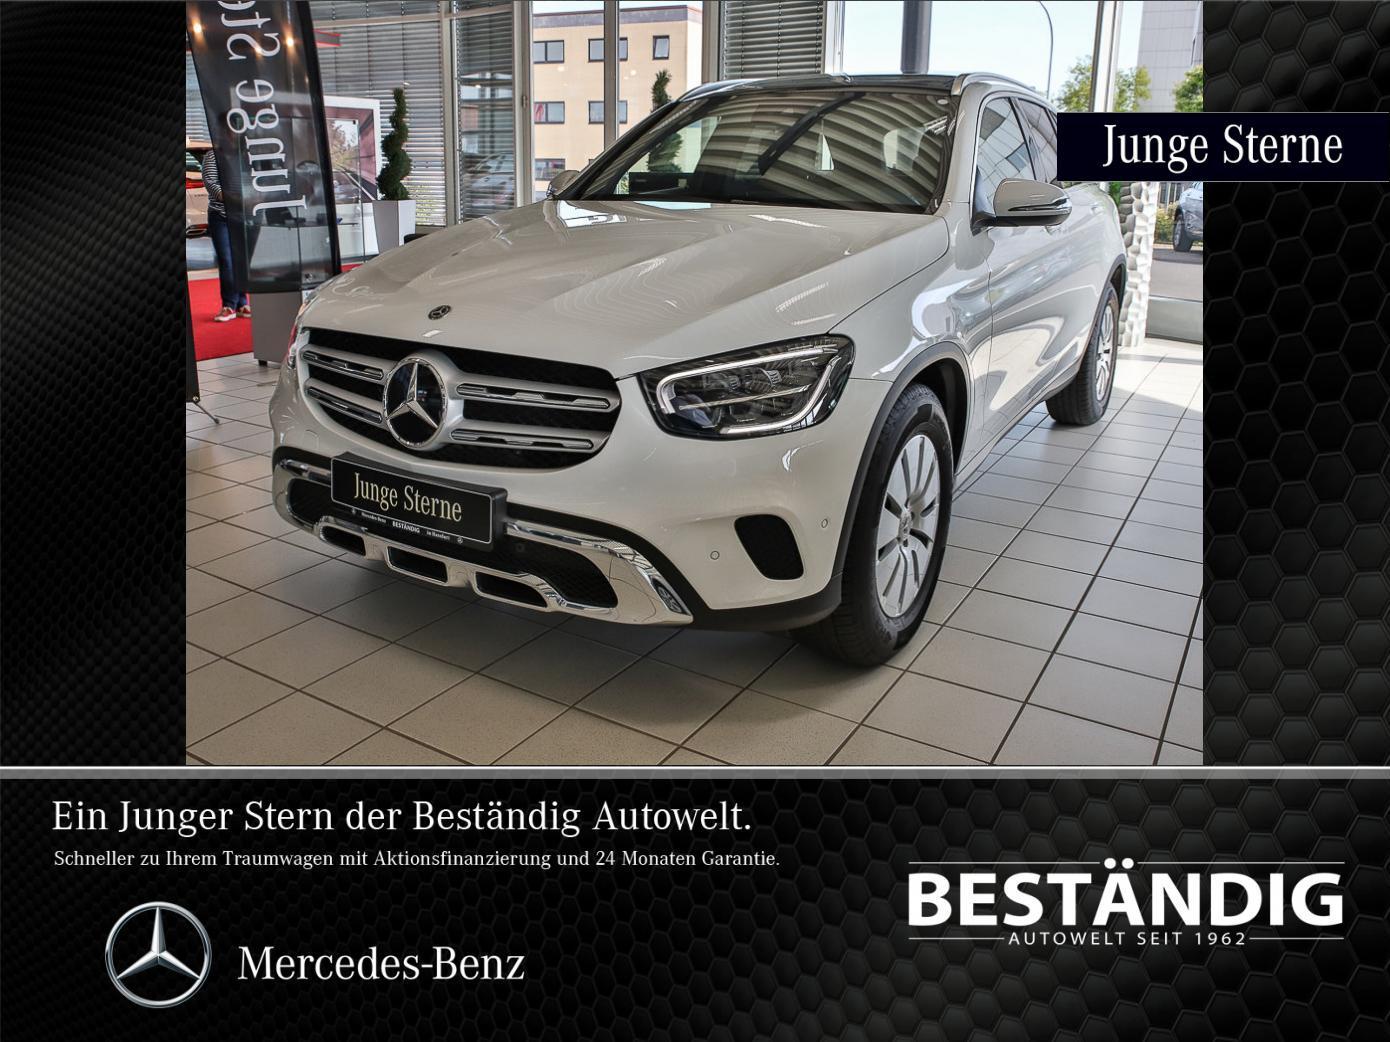 Mercedes-Benz GLC 200 4M Aut. AMG Int.*NAVI*TWA*PANO*SHZ*DAB+, Jahr 2019, Benzin